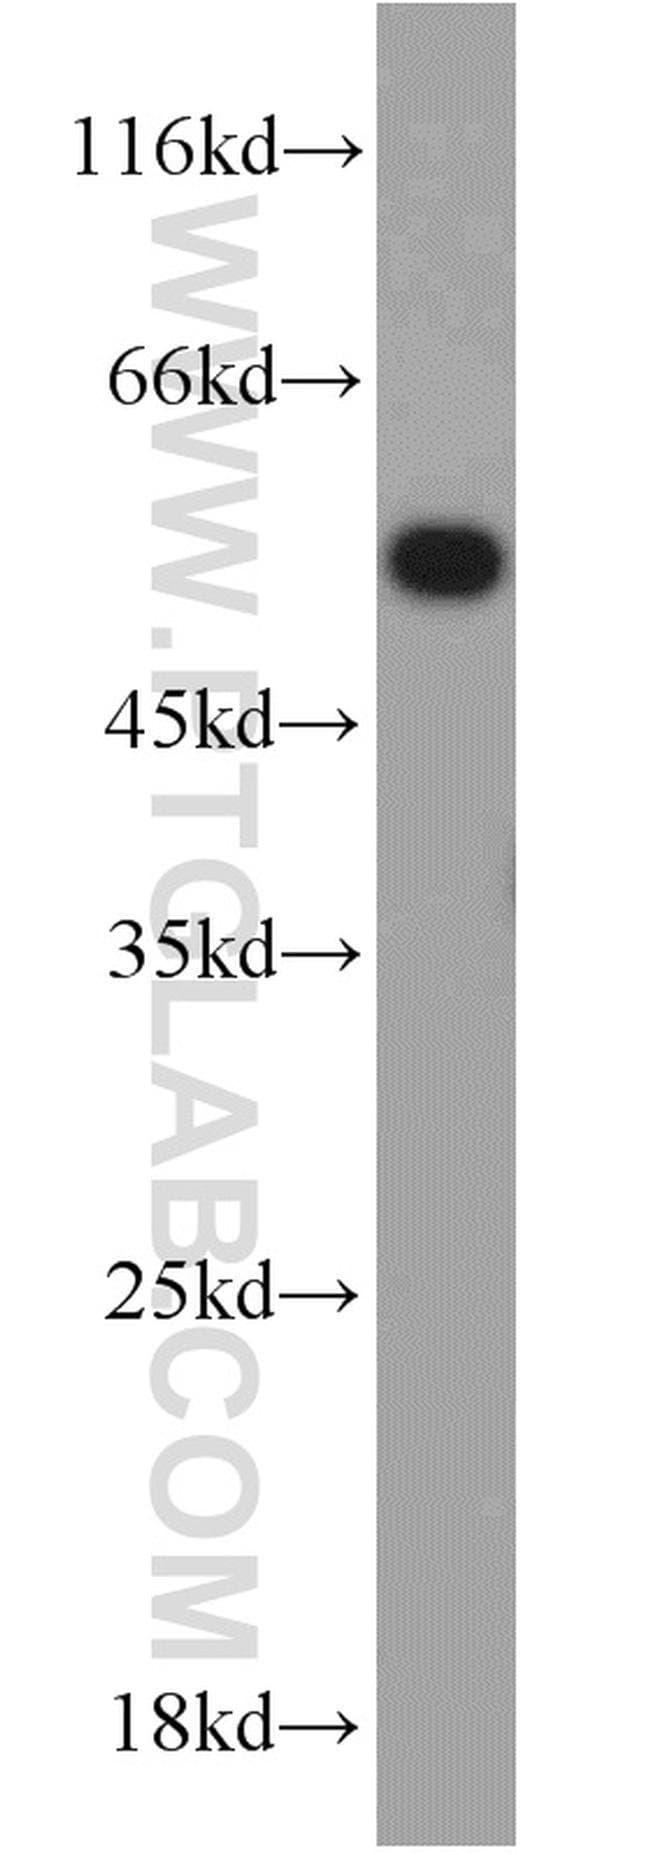 UBR7 Rabbit anti-Human, Mouse, Rat, Polyclonal, Proteintech 150 μL; Unconjugated Produkte